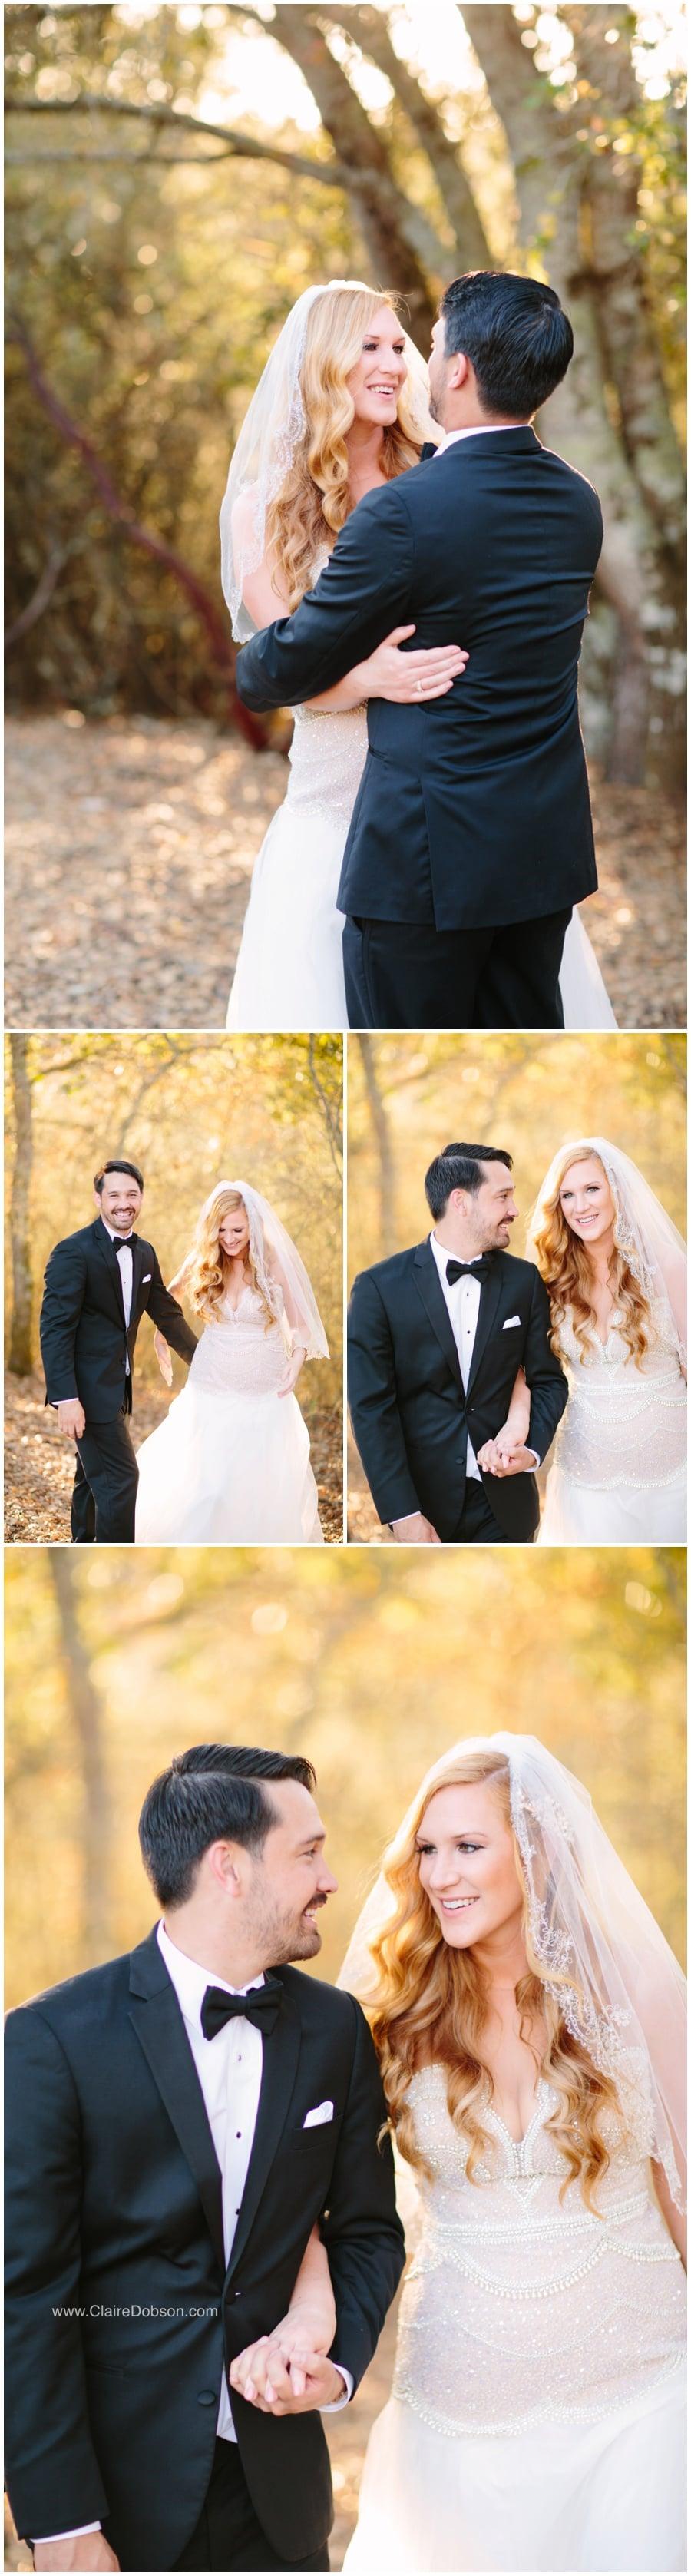 sonoma wedding photographer16